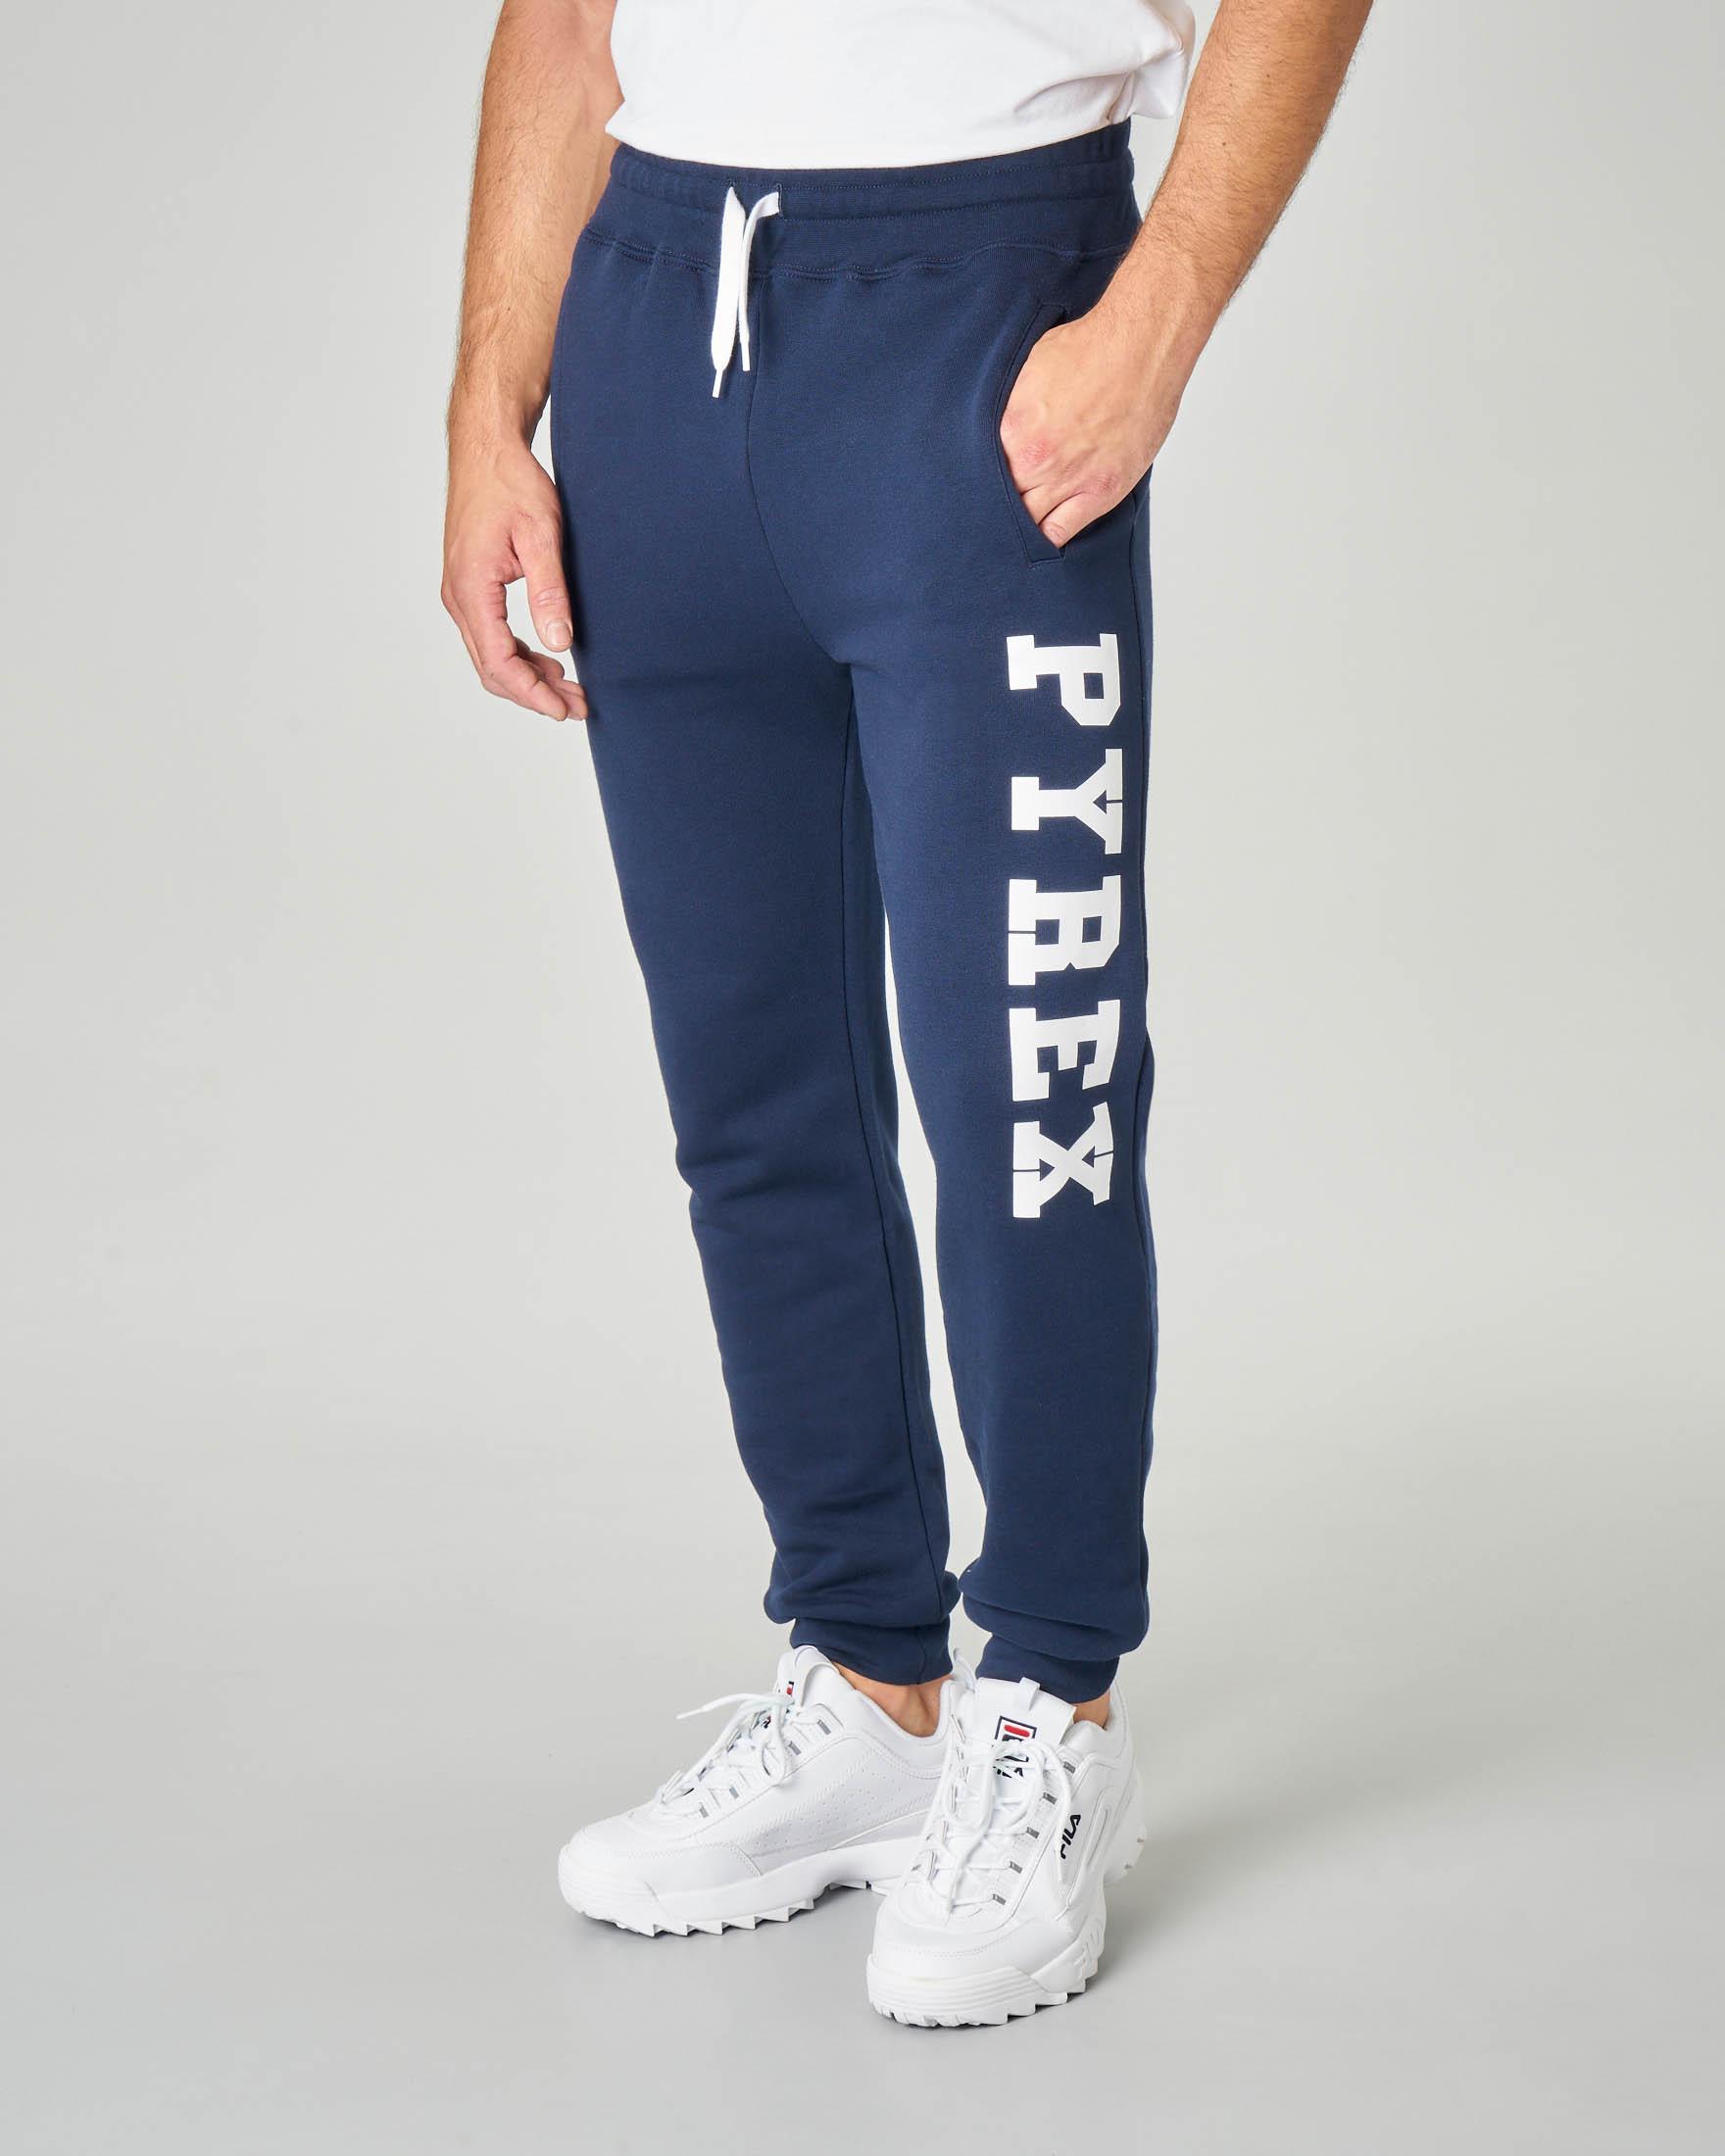 Pantalone in felpa blu con logo bianco